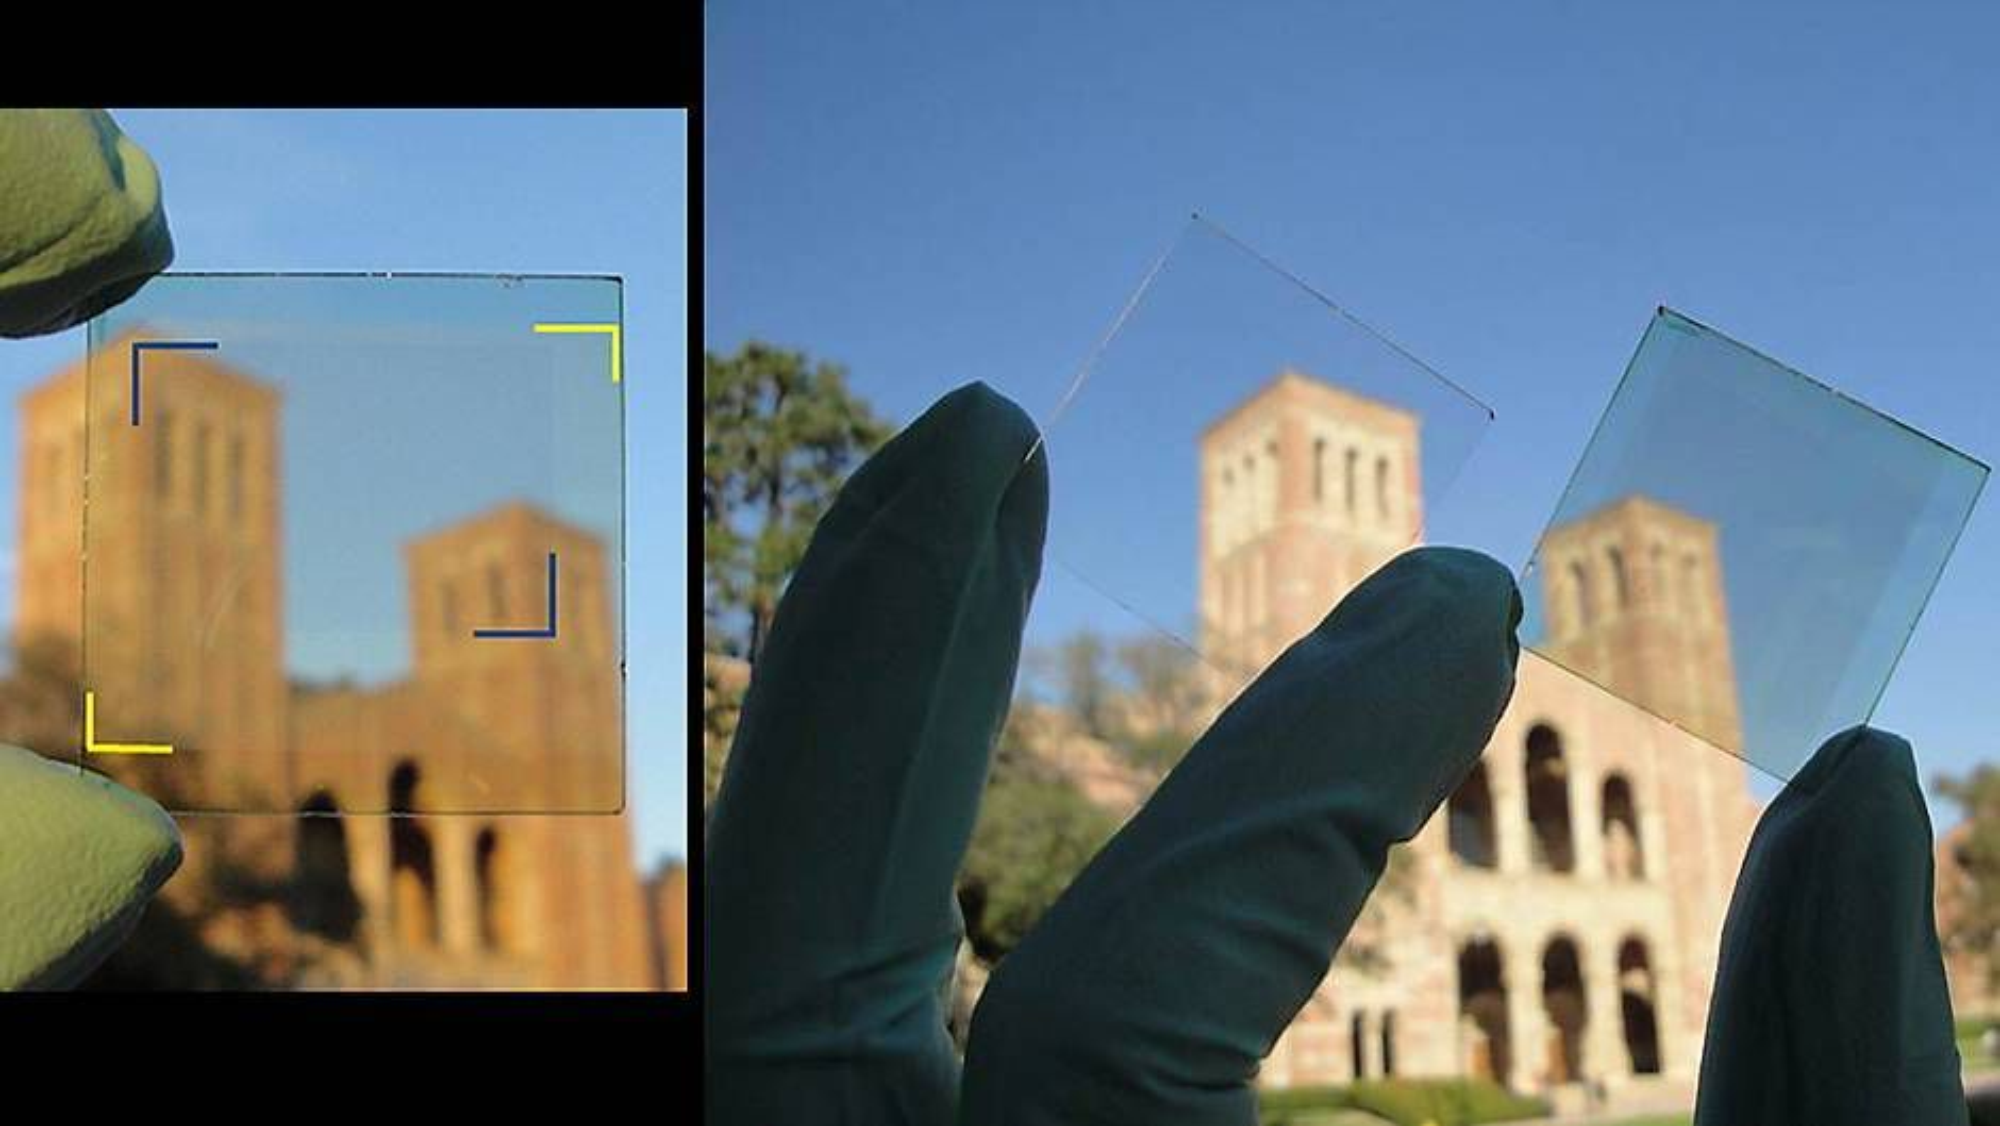 Dette glasset produserer strøm